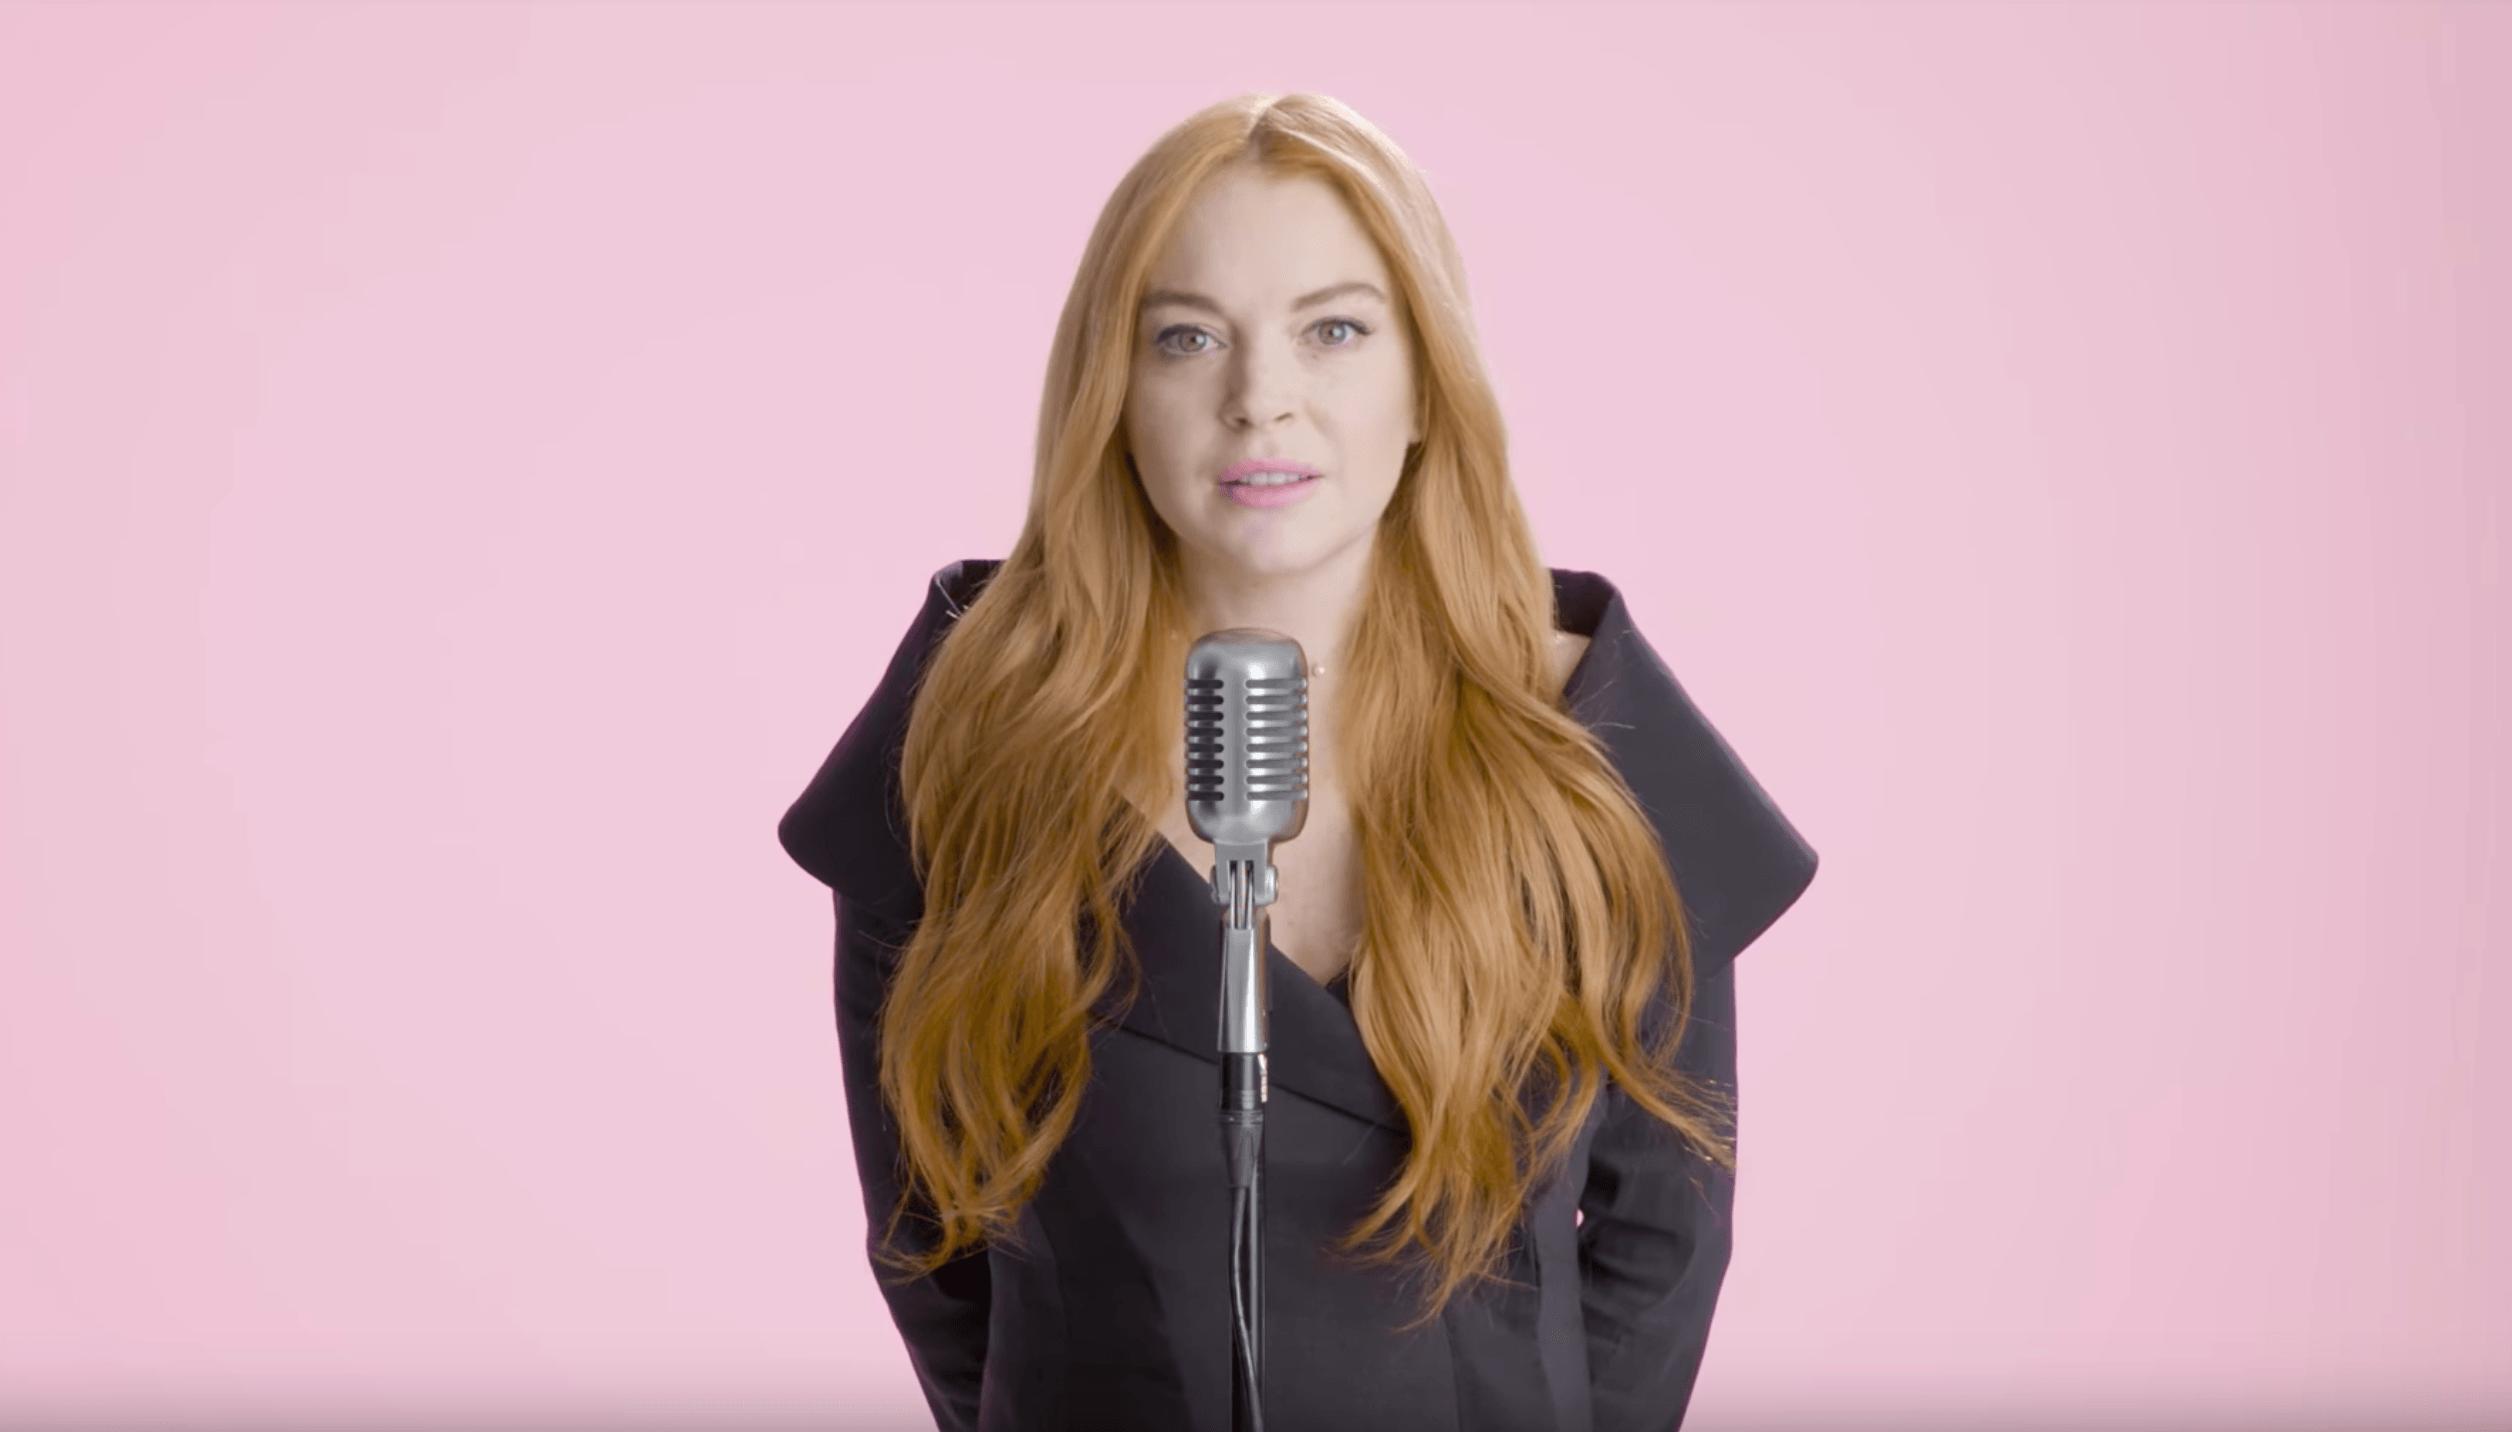 Lindsay Lohan Mean Girls Quotes W magazine